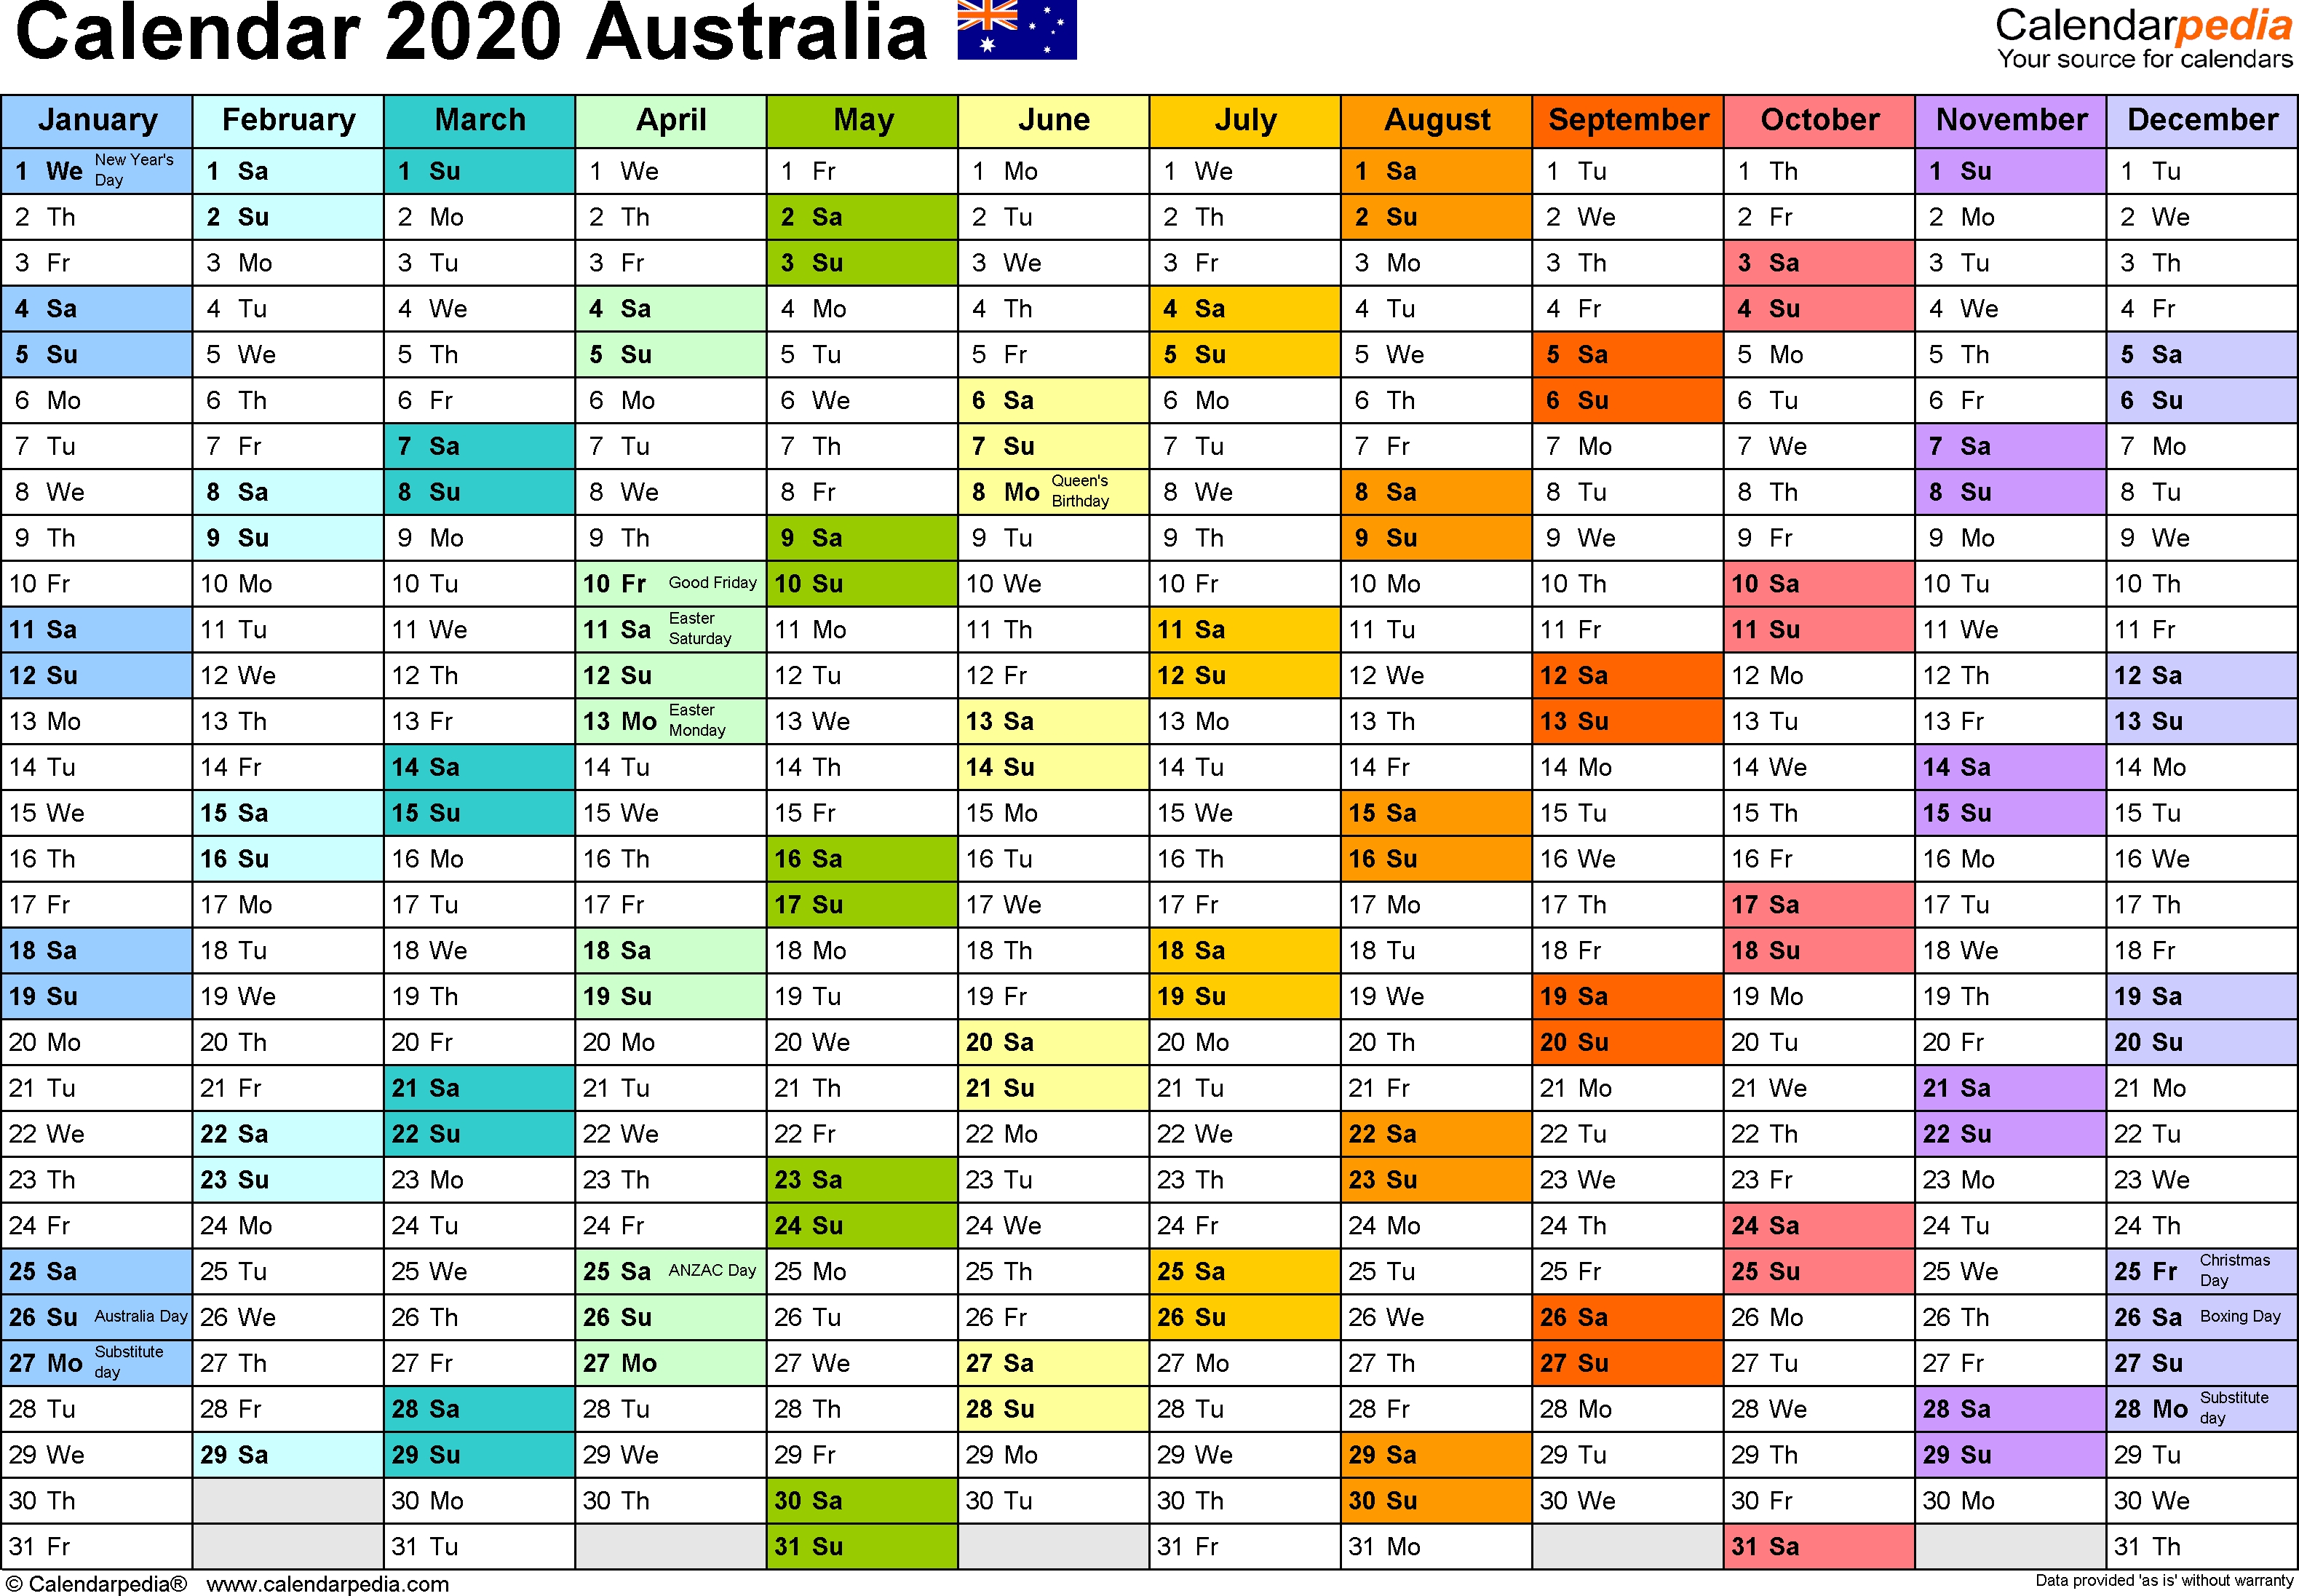 Australia Calendar 2020 - Free Printable Excel Templates-January 2020 Calendar Nsw